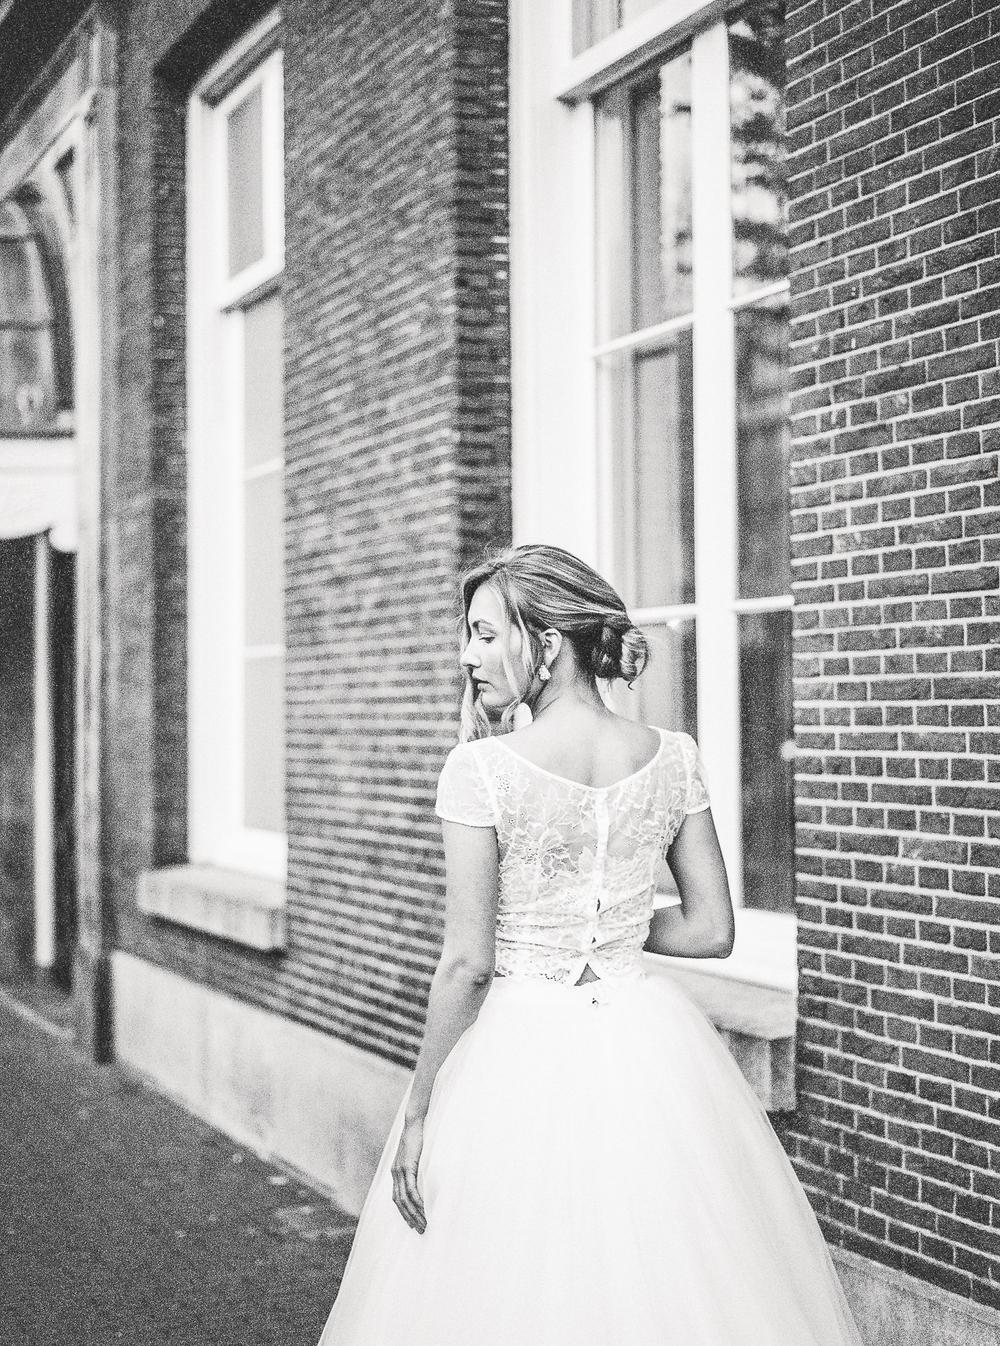 Amanda-Drost-Photography-1-2.jpg